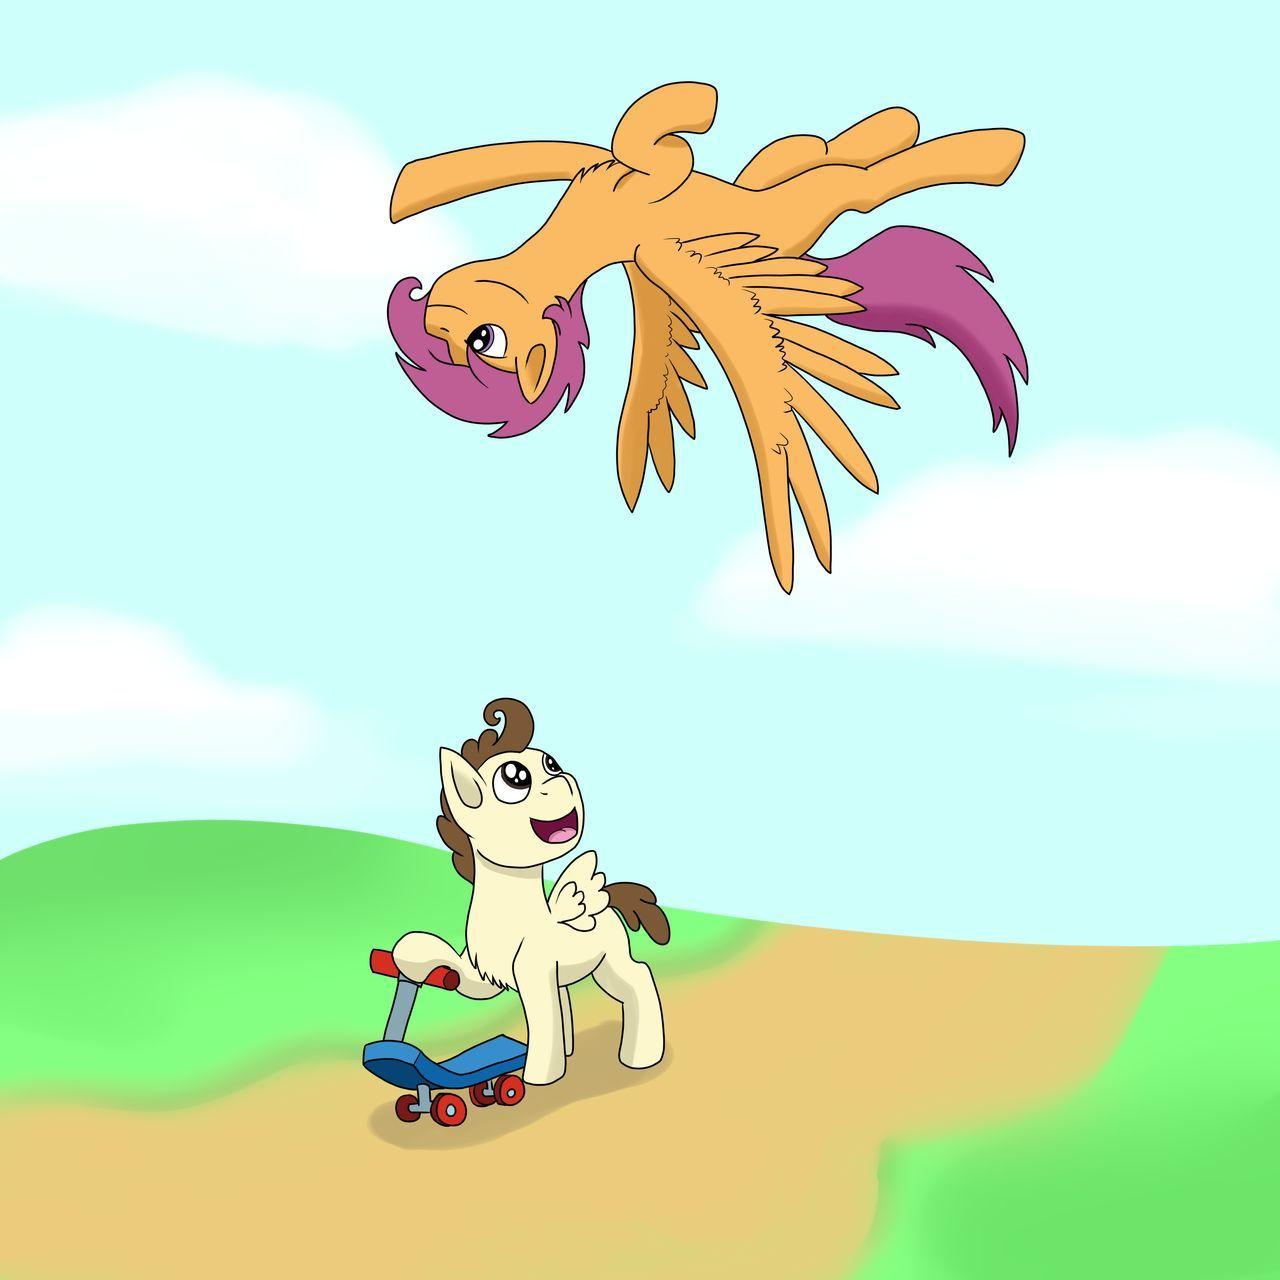 Pound Cake And Scootaloo Baby Pony Pony Headcanon Do you like this video? pound cake and scootaloo baby pony